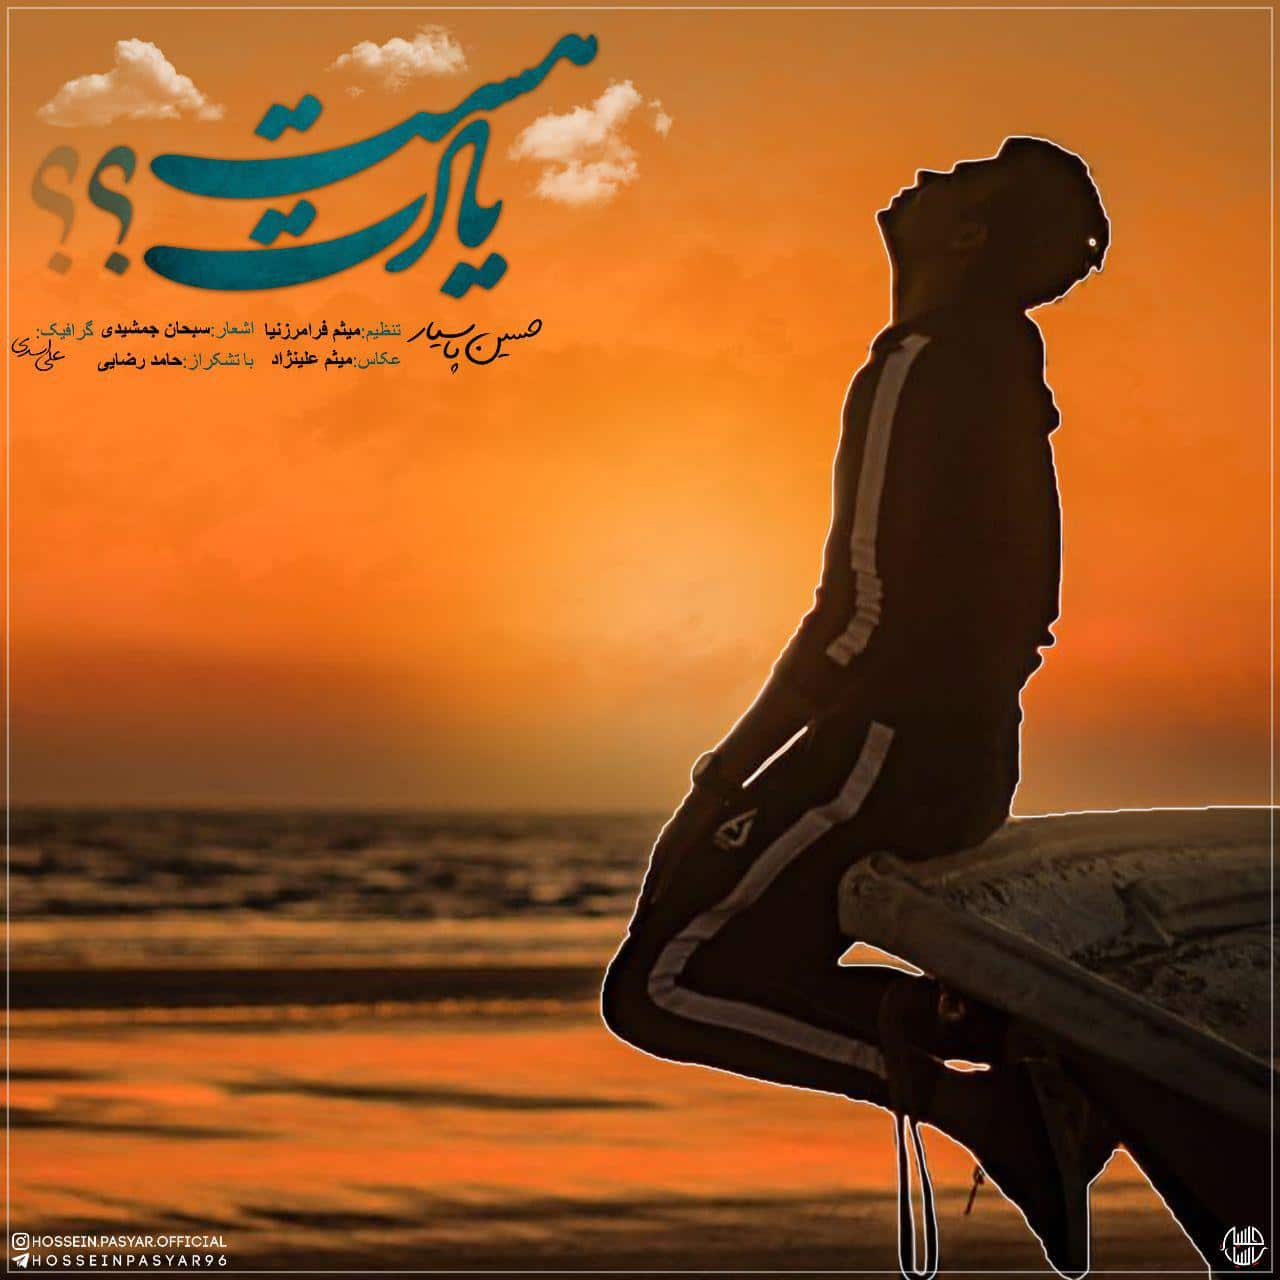 photo_2019-11-01_04-10-45-300x300 دانلود آهنگ لری جدید حسین پاسیار به نام یادت هست